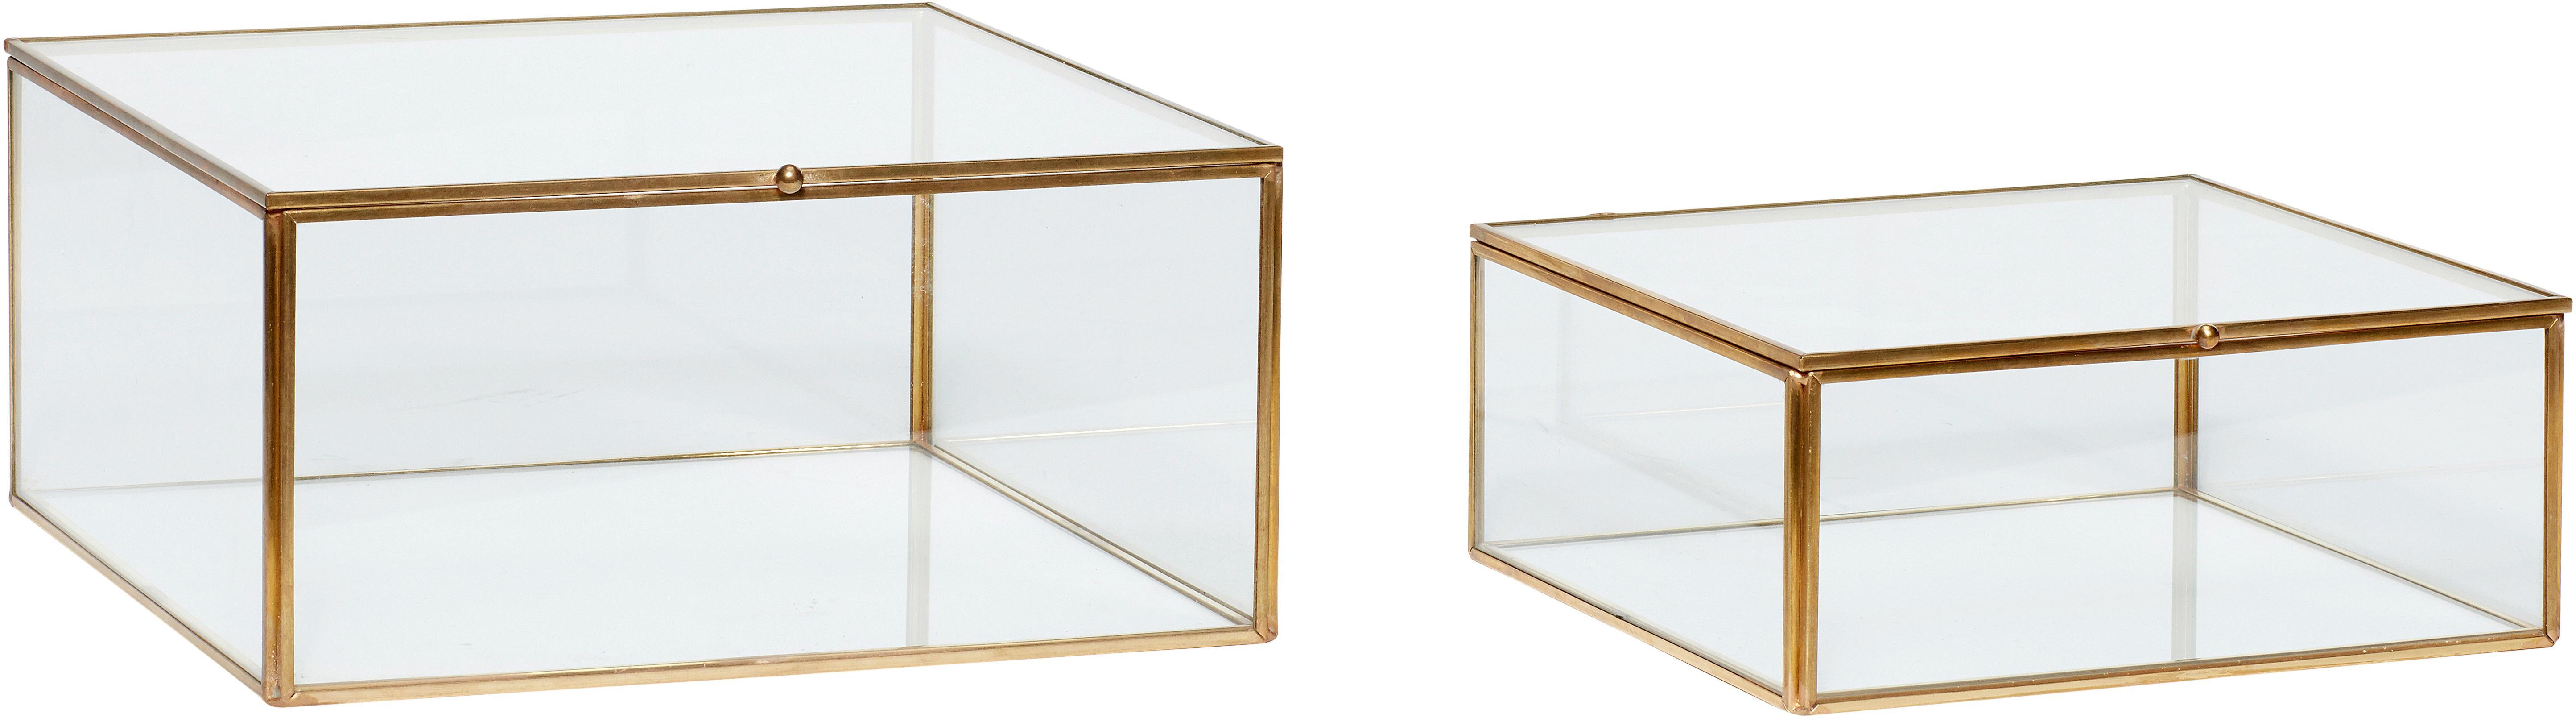 Set de cajas Karie, 2pzas., Caja: vidrio, Latón, transparente, Tamaños diferentes